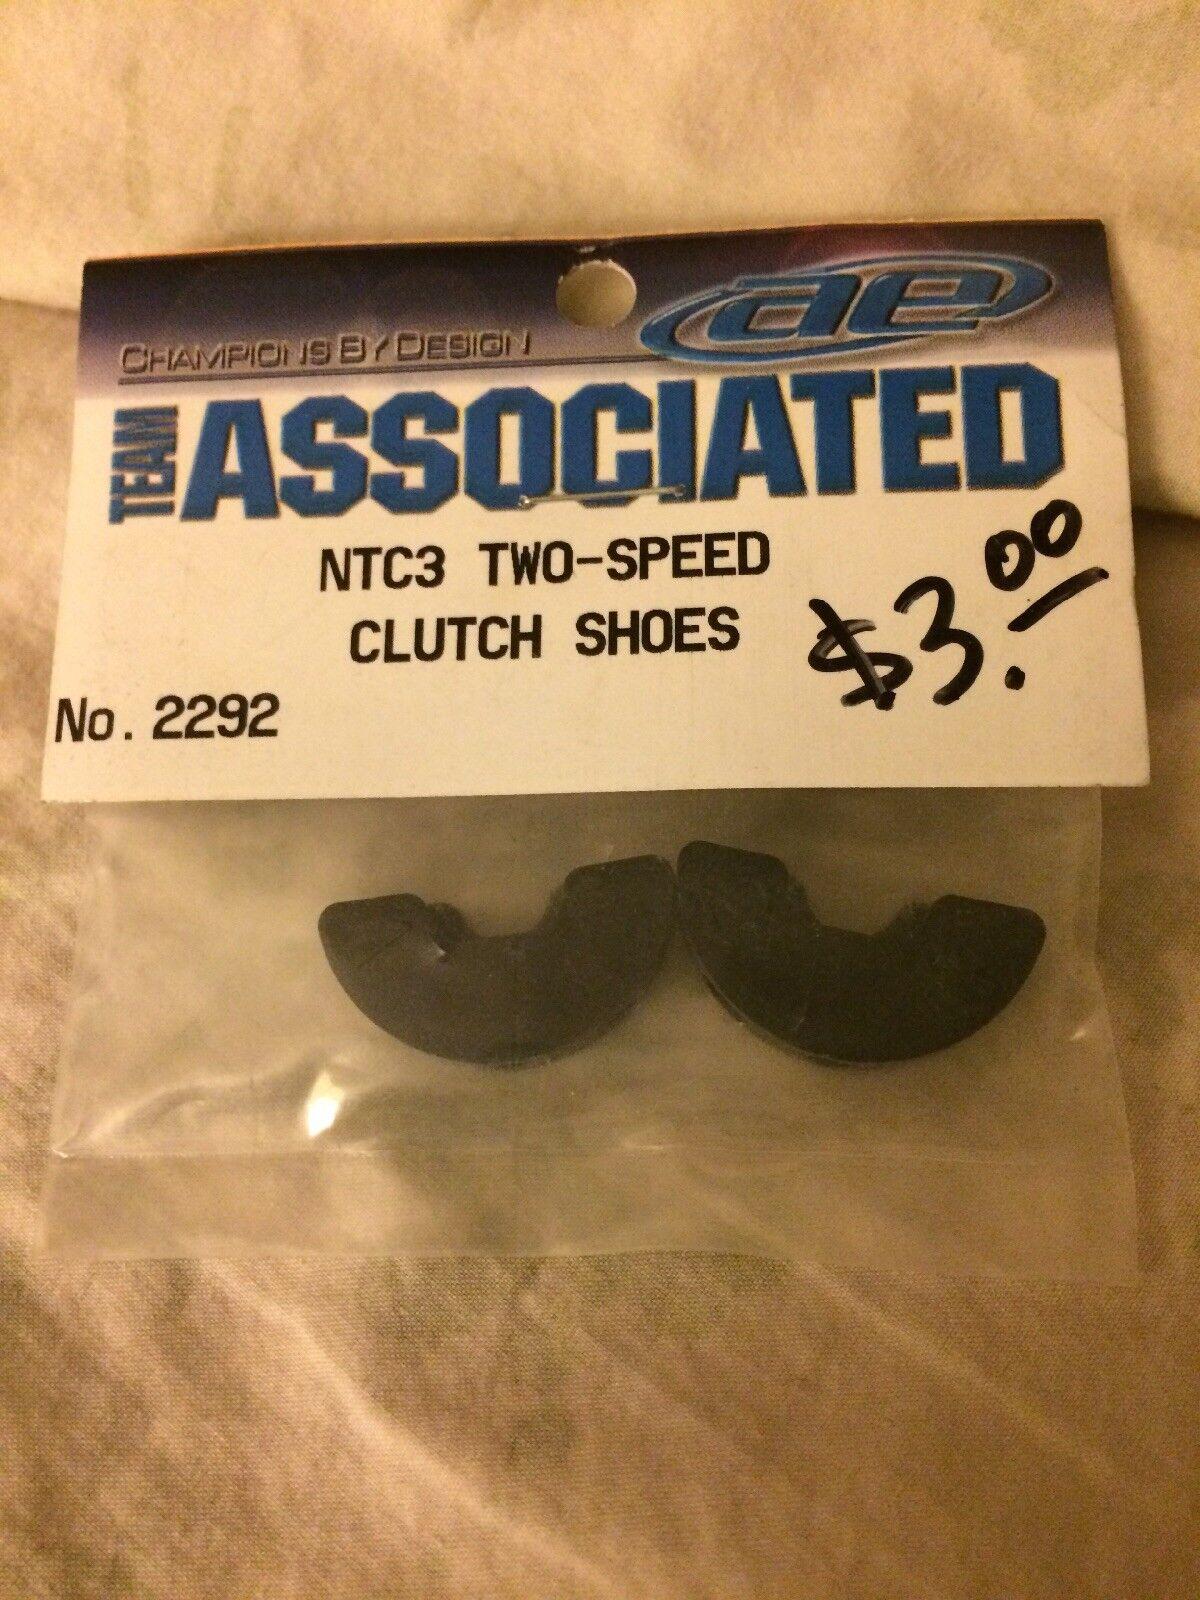 GT2 Clutch Shoes 2310 Associated NTC3